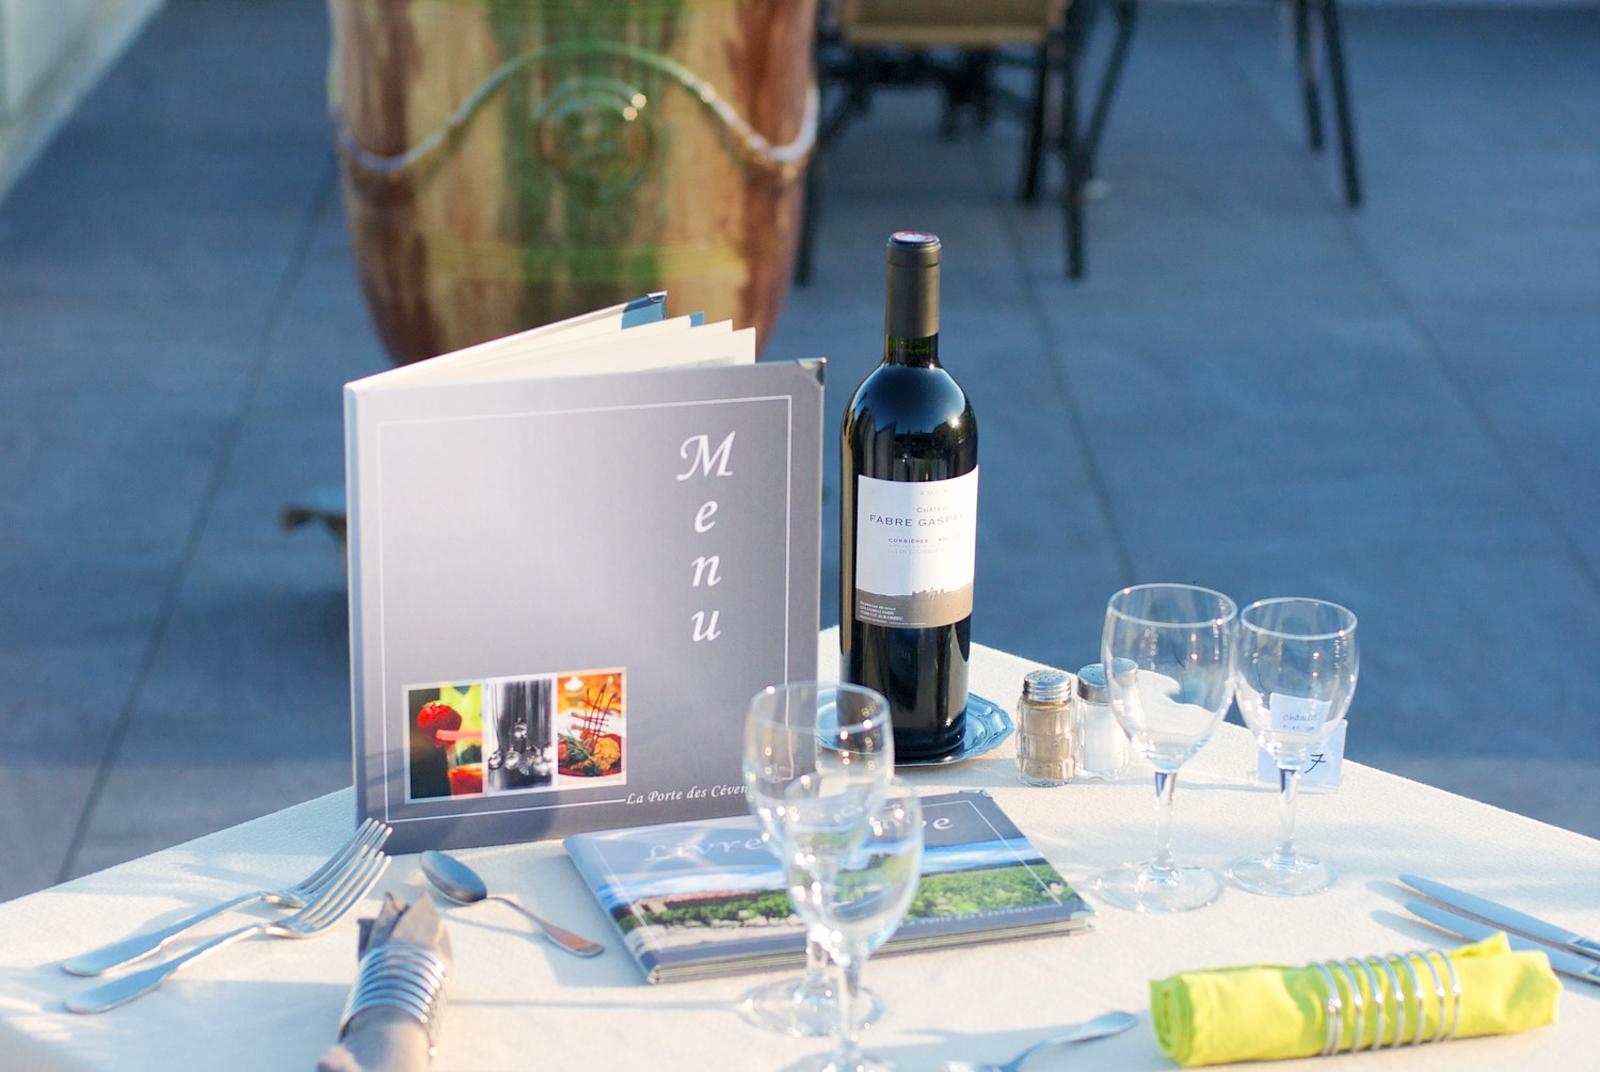 006_Hotel_Restaurant_Anduze_Cevennes_Cuisine_Mediterraneenne_Produits_Terroirs_Cevenols